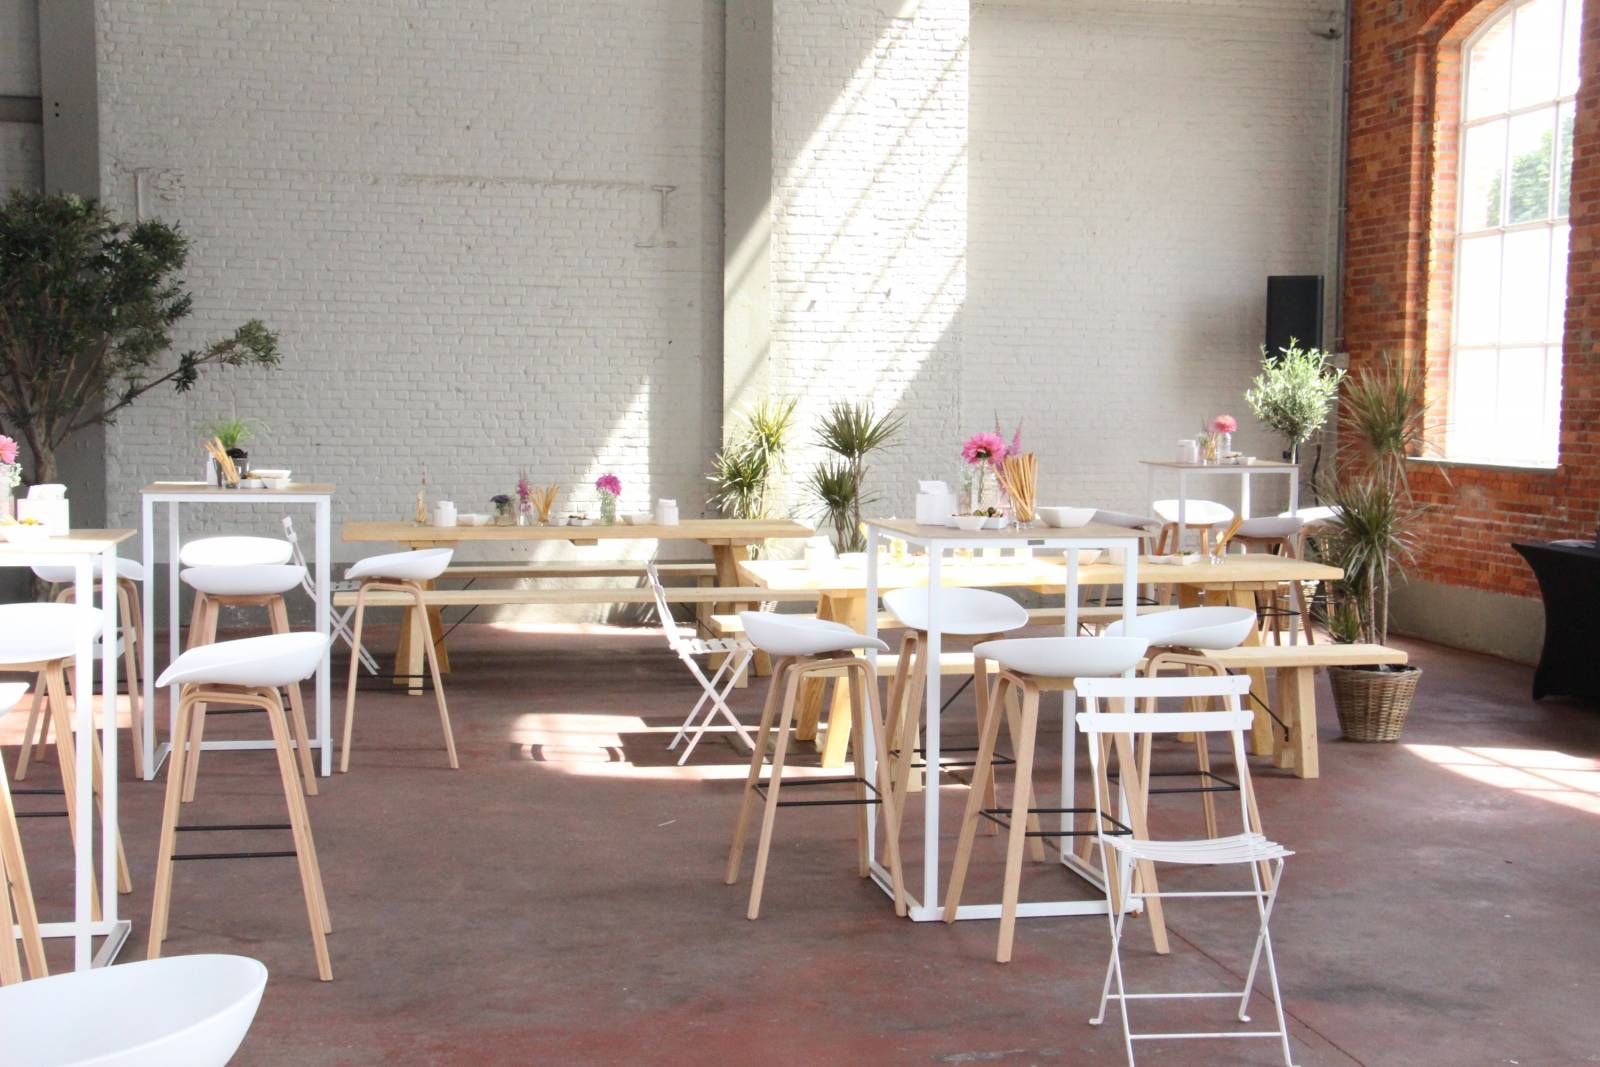 Hangar 43 - Feestzaal Oost-Vlaanderen - Industrieel - House of Weddings - 19